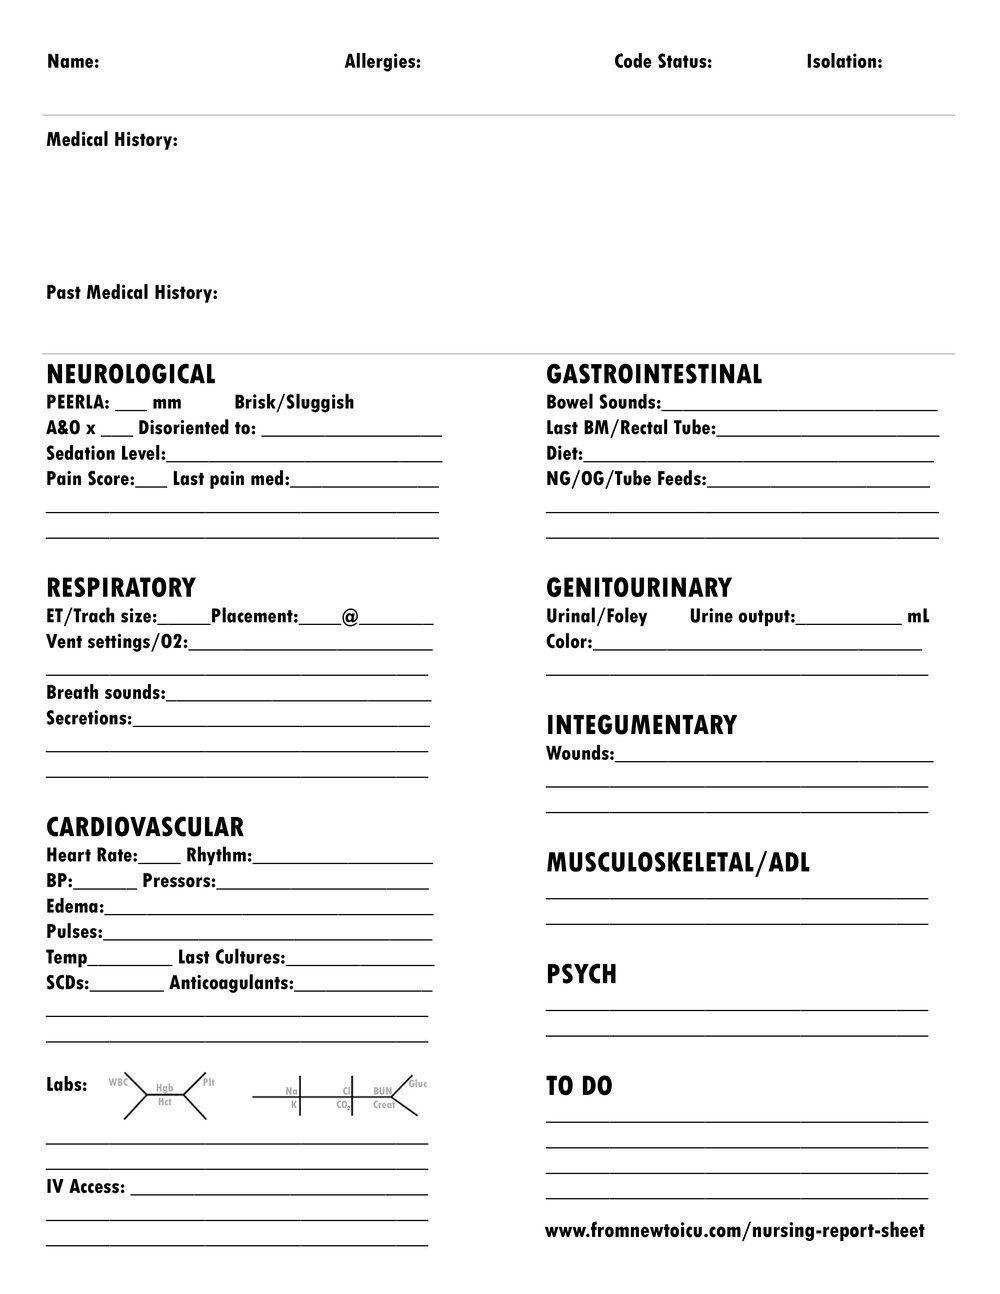 005 Archaicawful Nursing Report Sheet Template Sample  Icu Rn PrintableFull